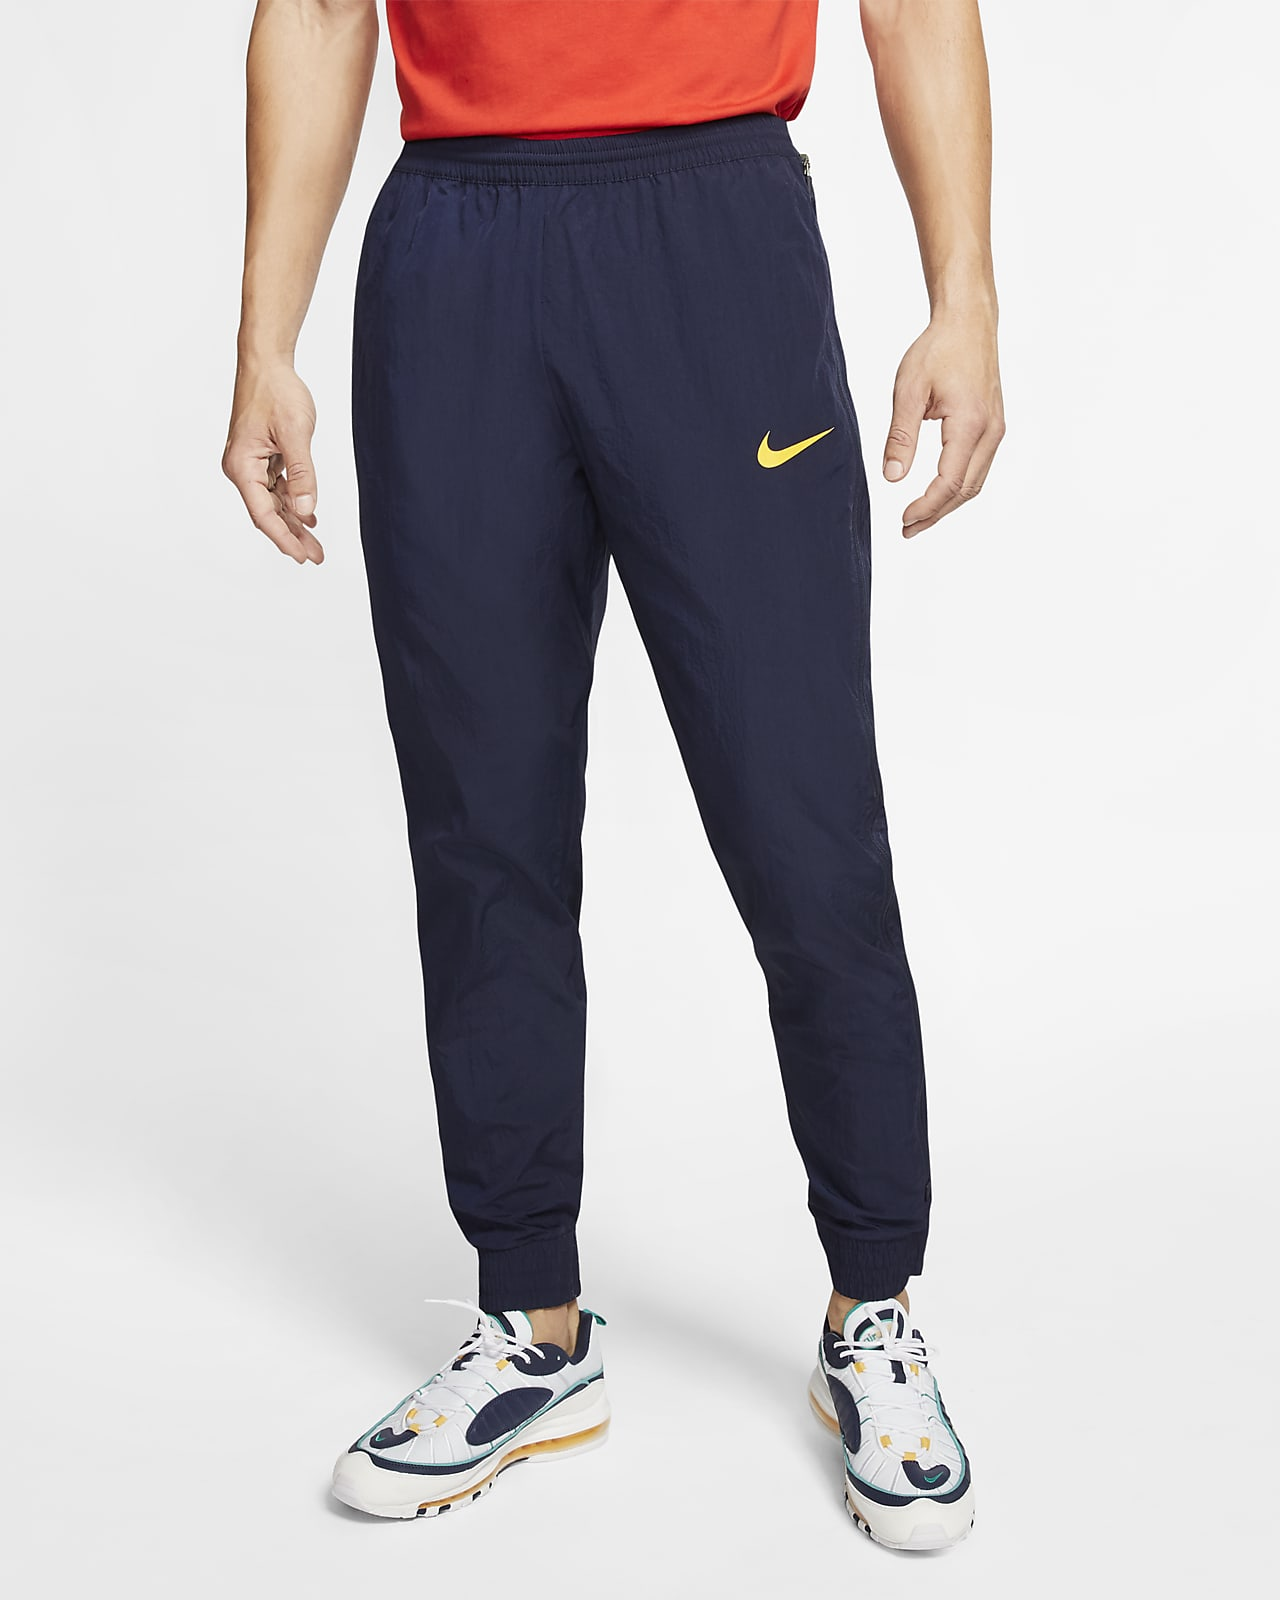 Nike F.C. gewebte Herren-Fußballhose